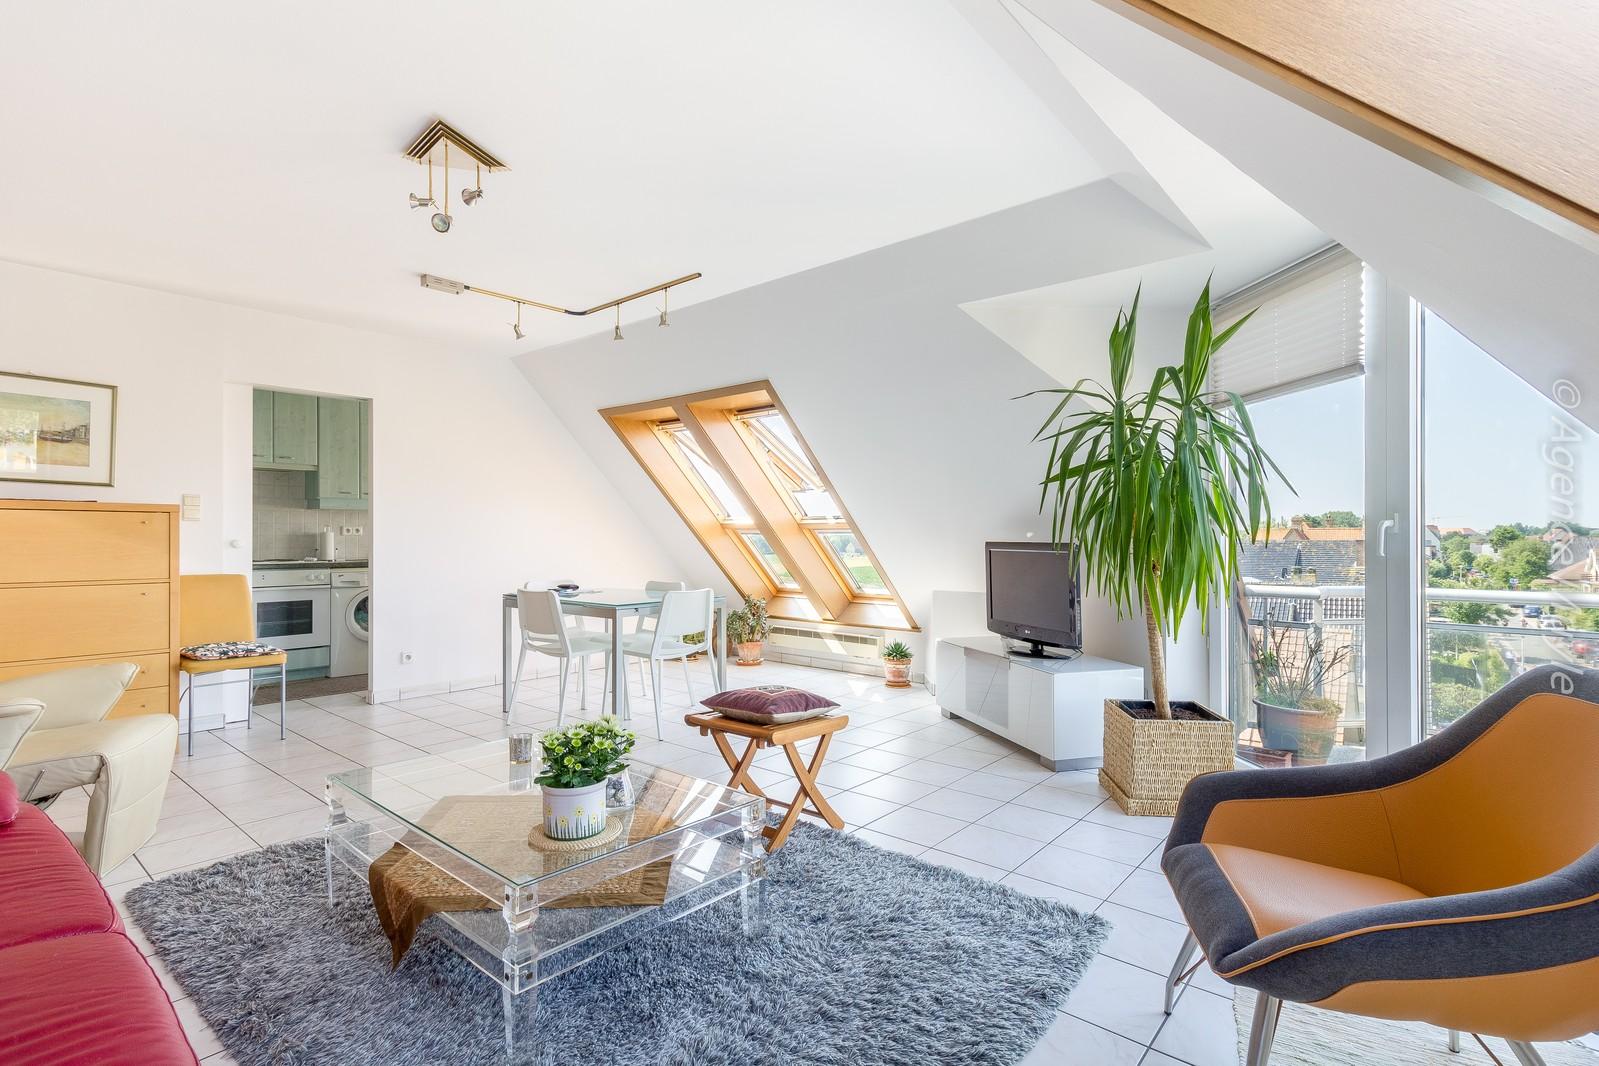 Riant penthouse - duplex met 2 kamers en zonnig terras